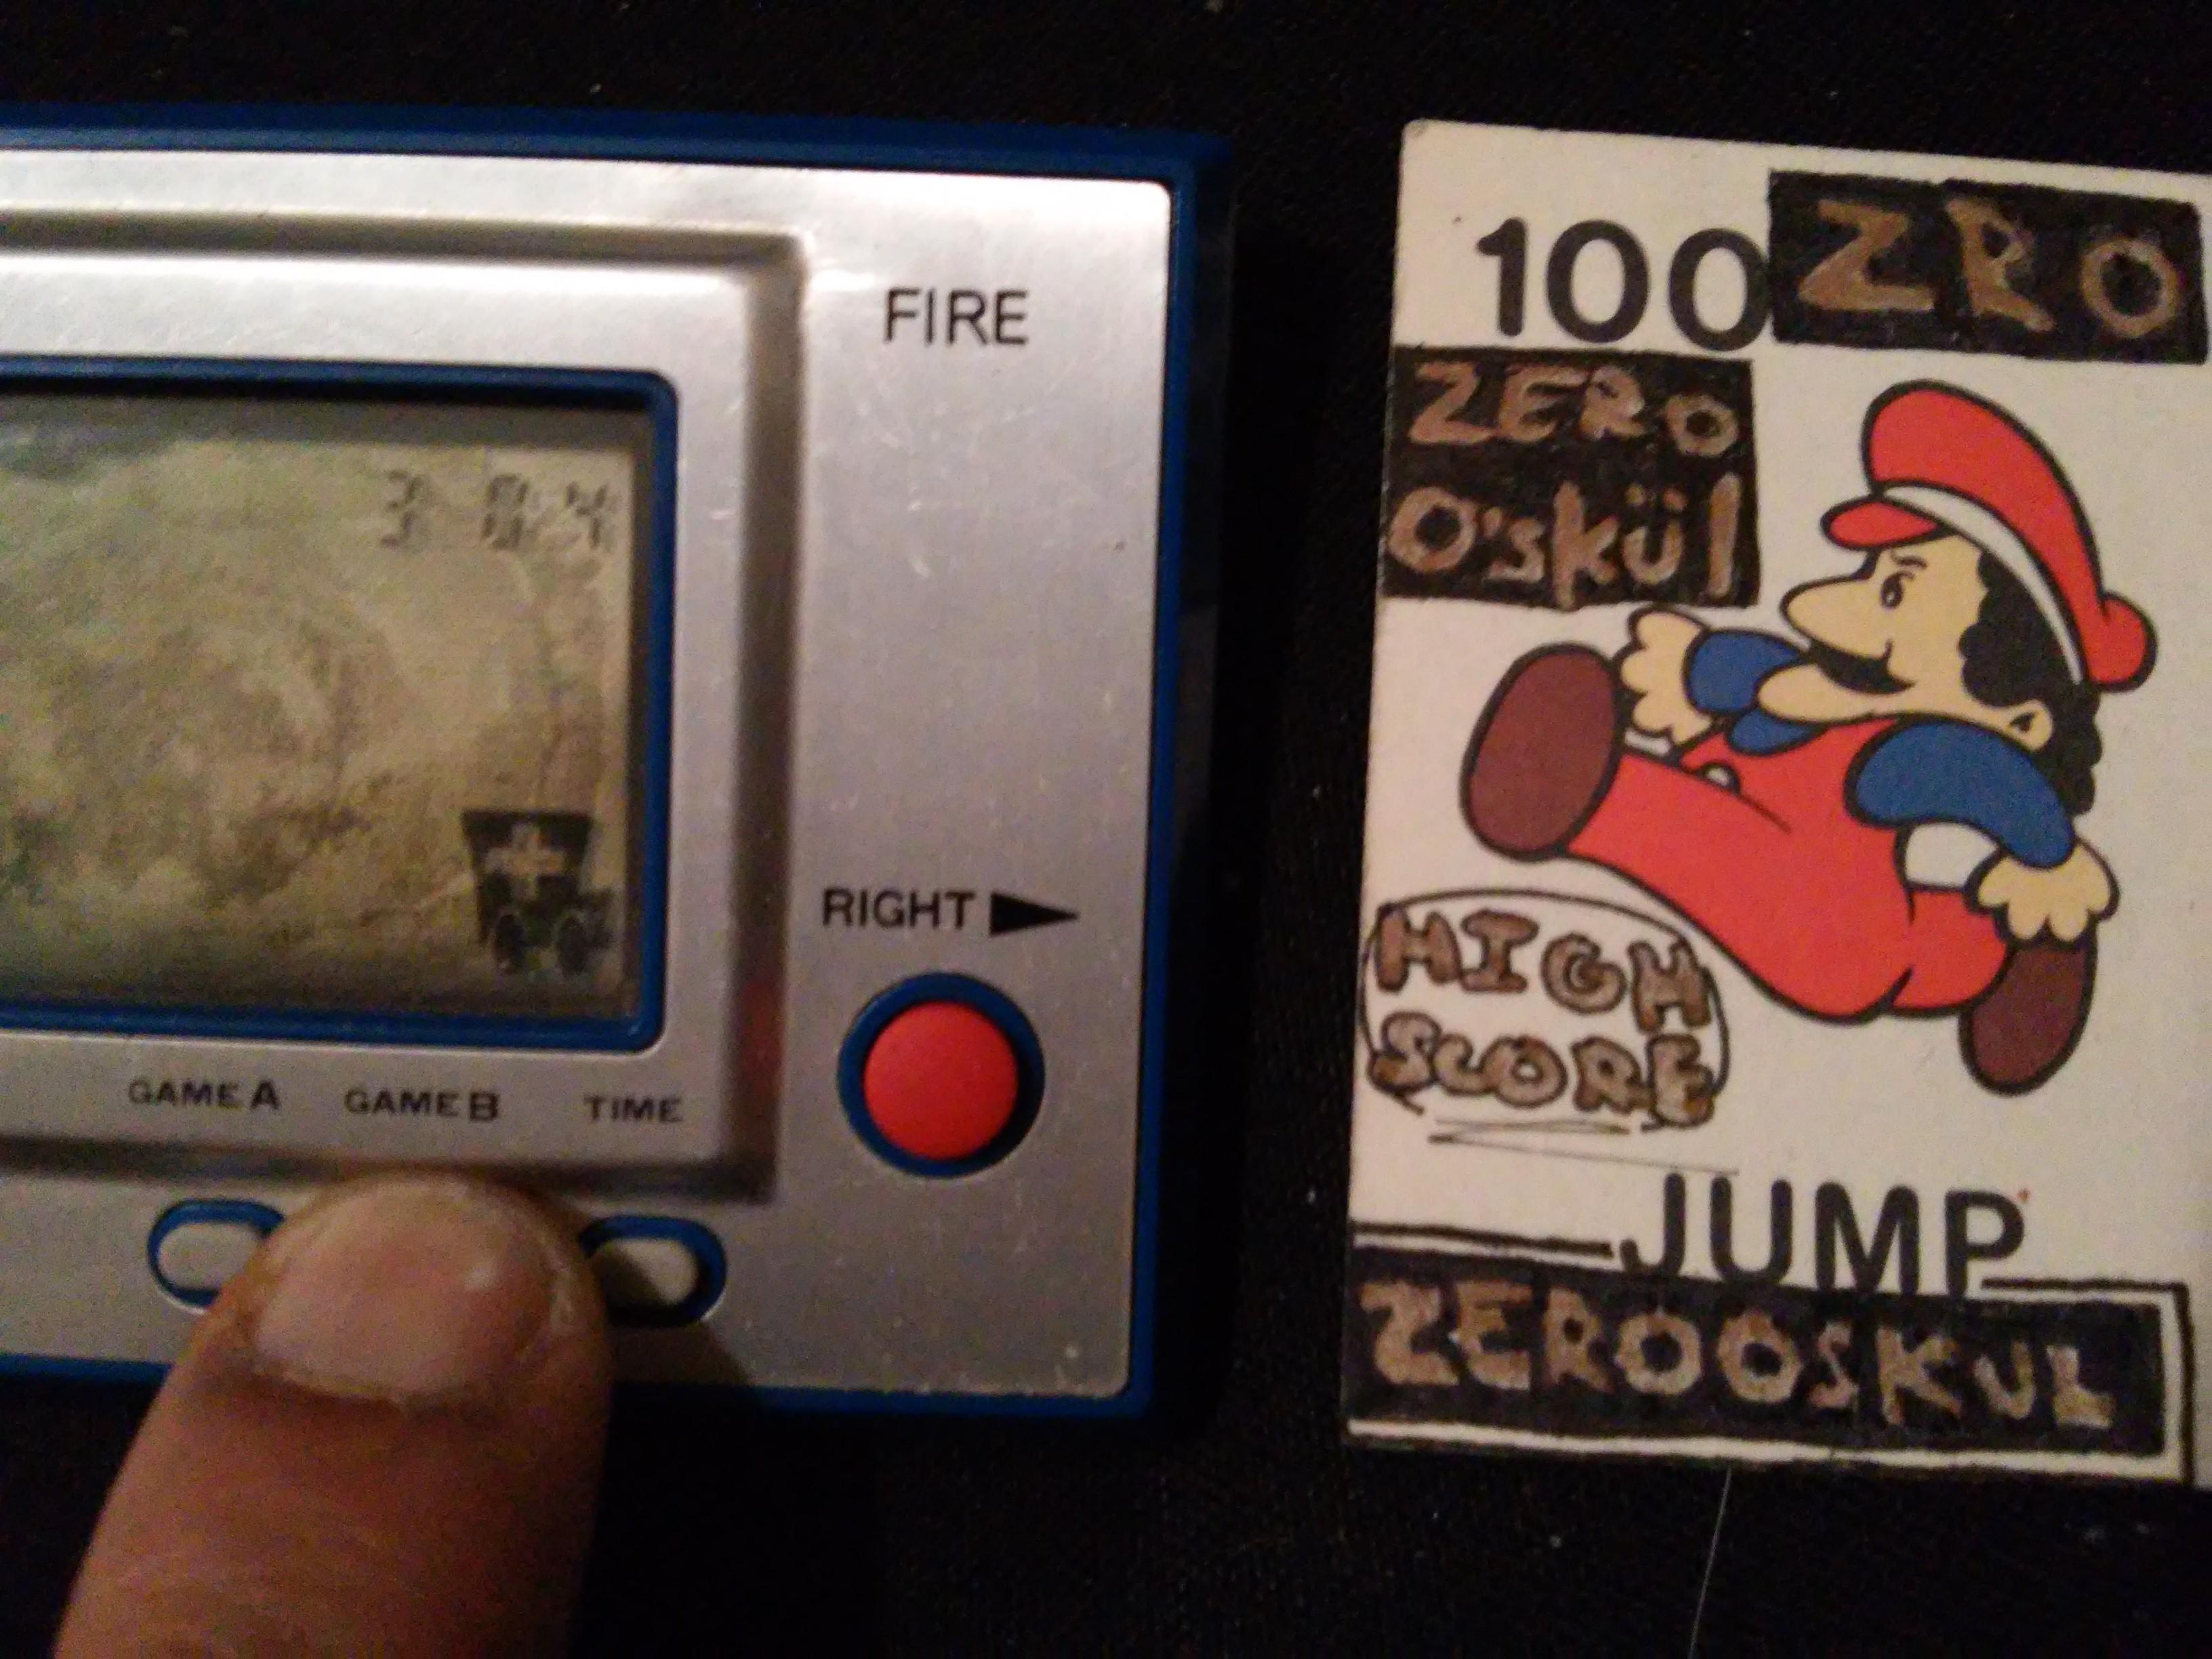 zerooskul: Game & Watch: Fire [aka Fireman Fireman] [Game B] (Dedicated Handheld) 304 points on 2019-01-27 21:38:12